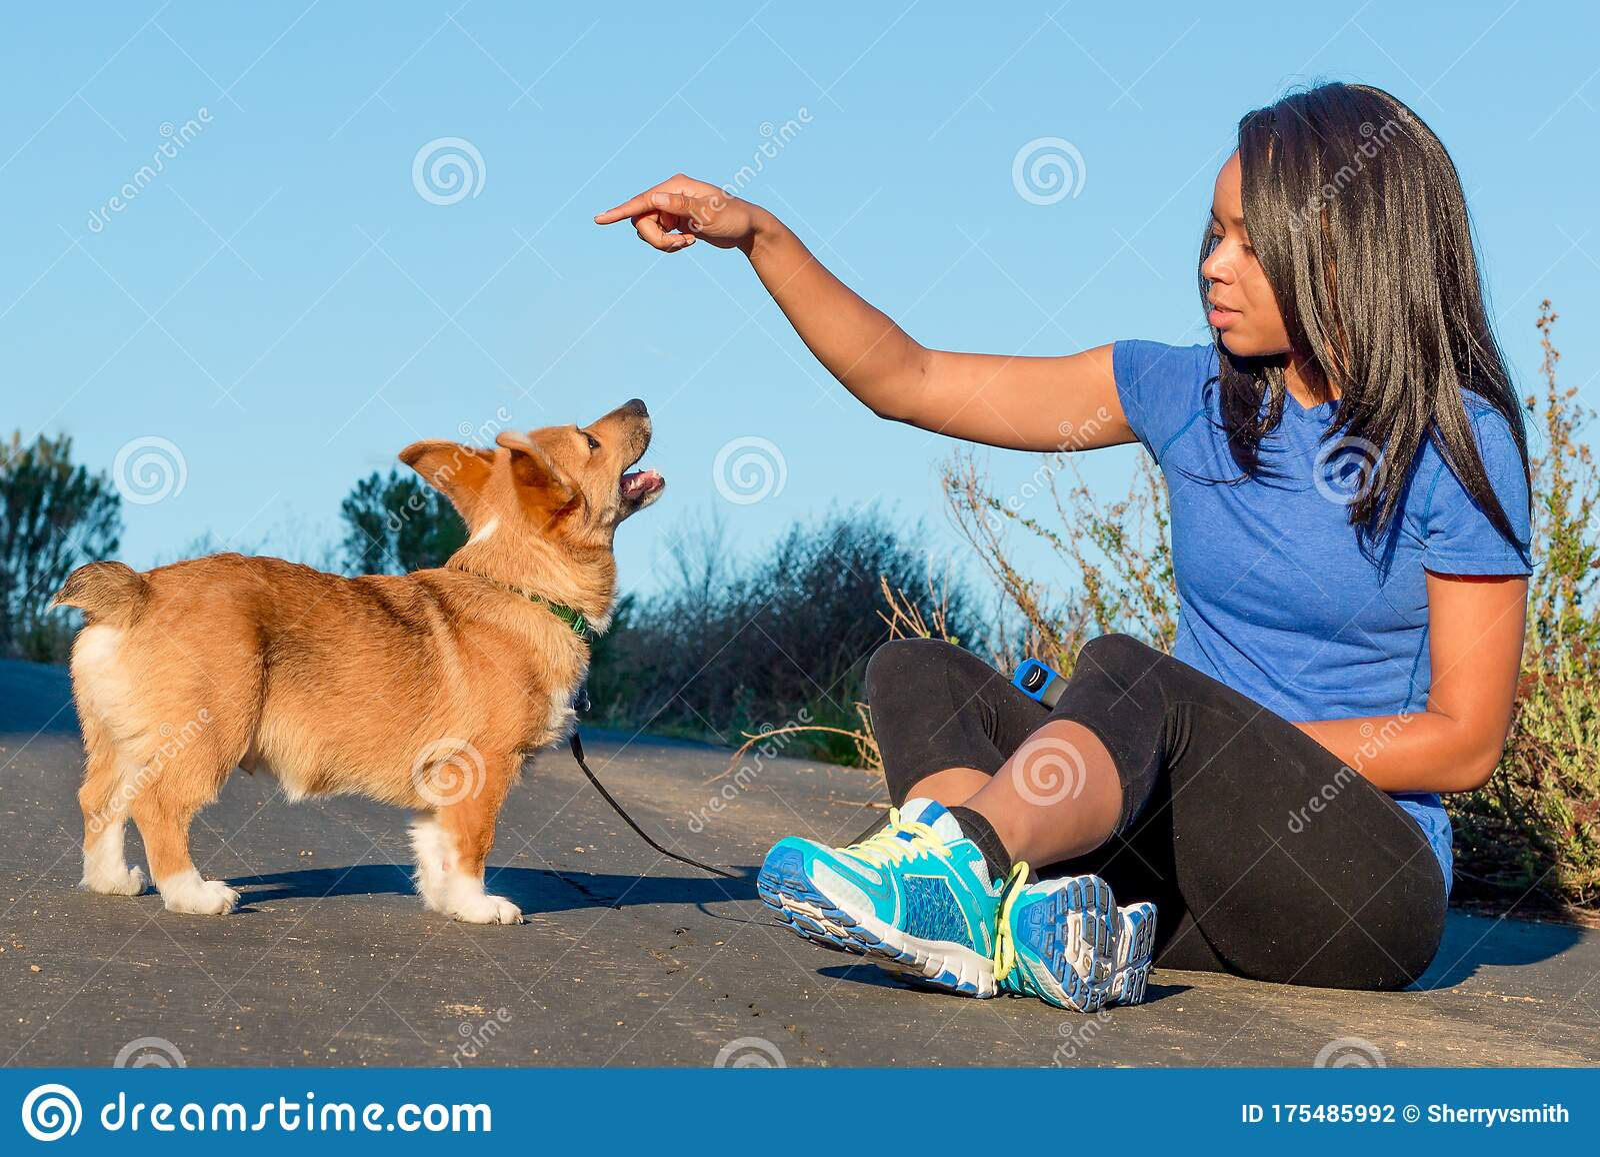 African American Millennial Woman Training Corgi Puppy Stock Photo Image Of Cute Lady 175485992